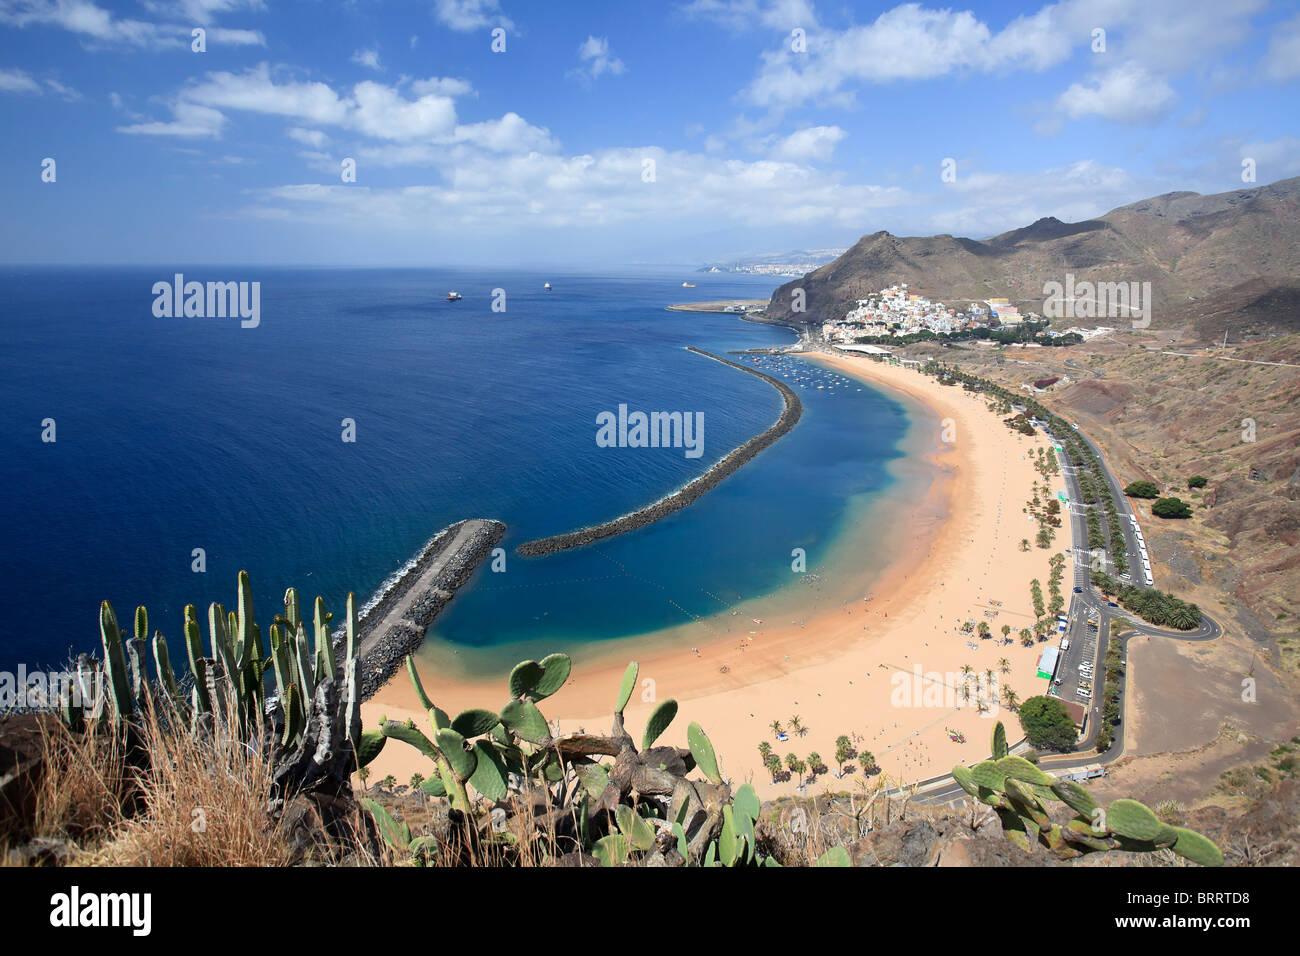 Kanarischen Inseln, Teneriffa, Playa de Las Teresitas Stockbild